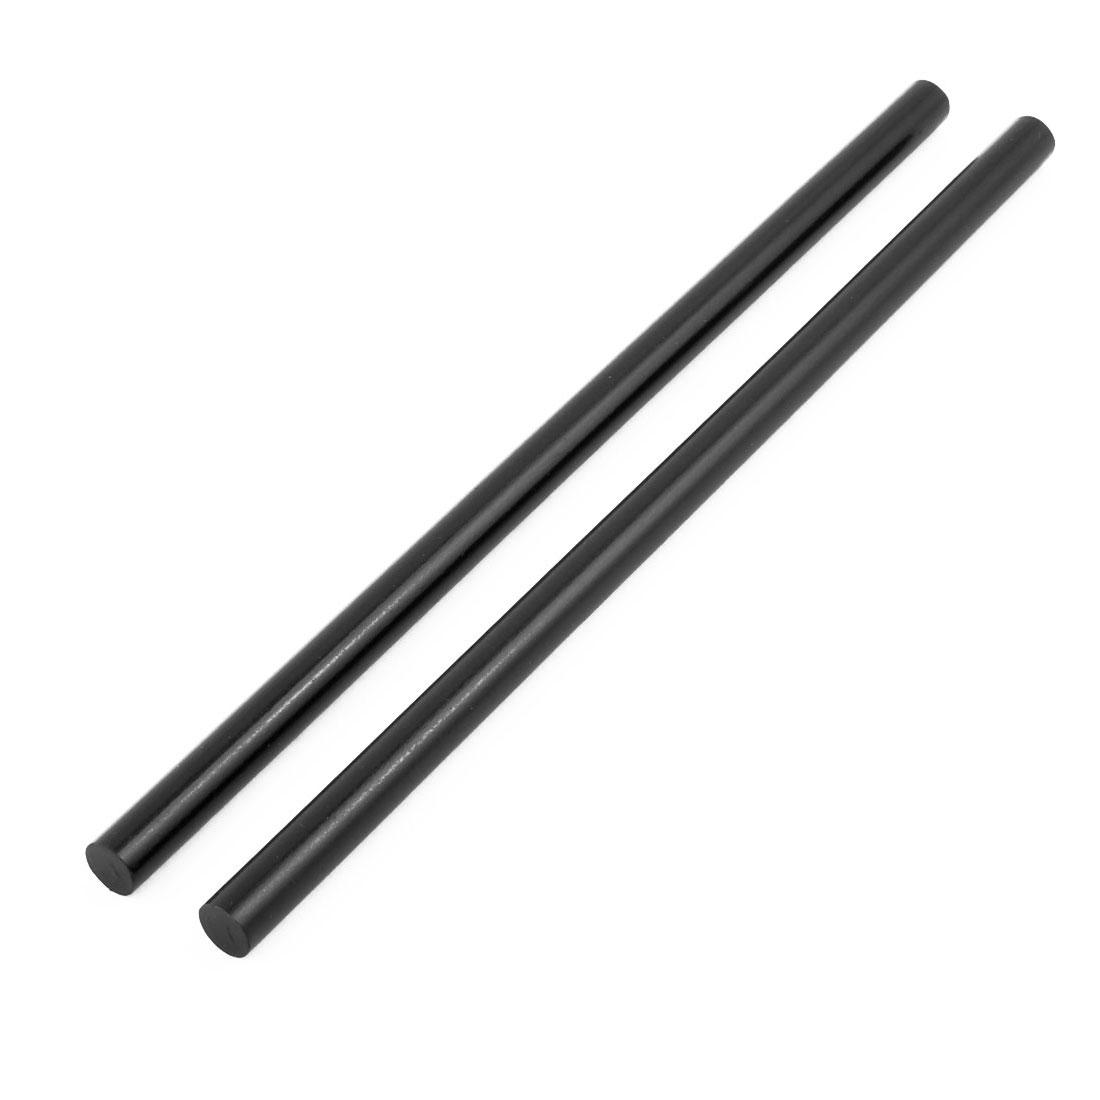 2 Pcs 11mm x 270mm Black Hot Melt Glue Stick for Electric Tool Hot Melt Glue Gun